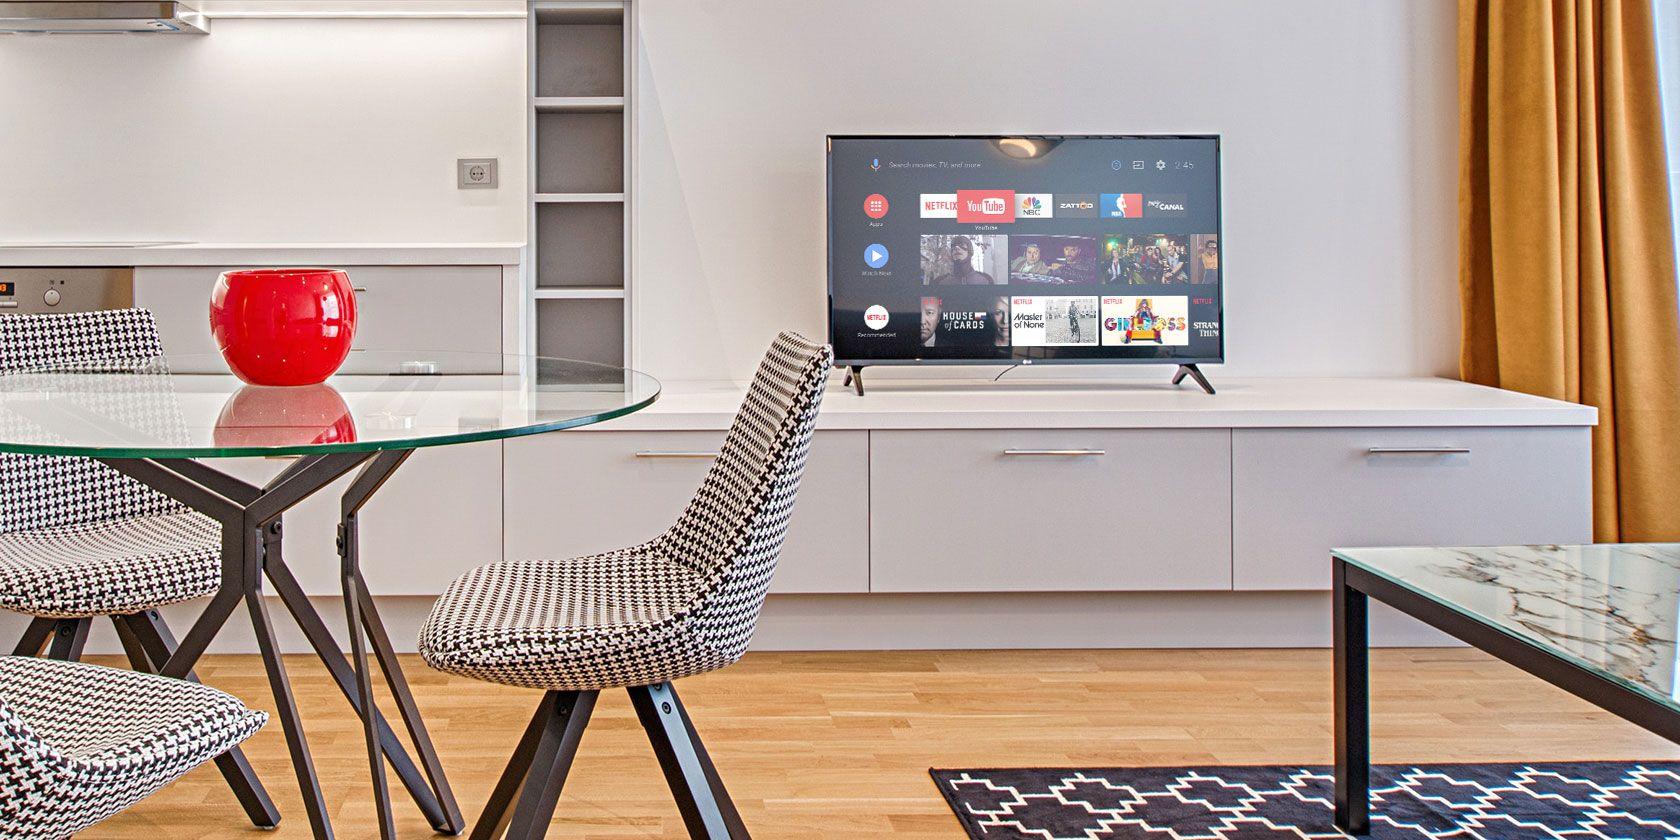 android-tv-chromecast